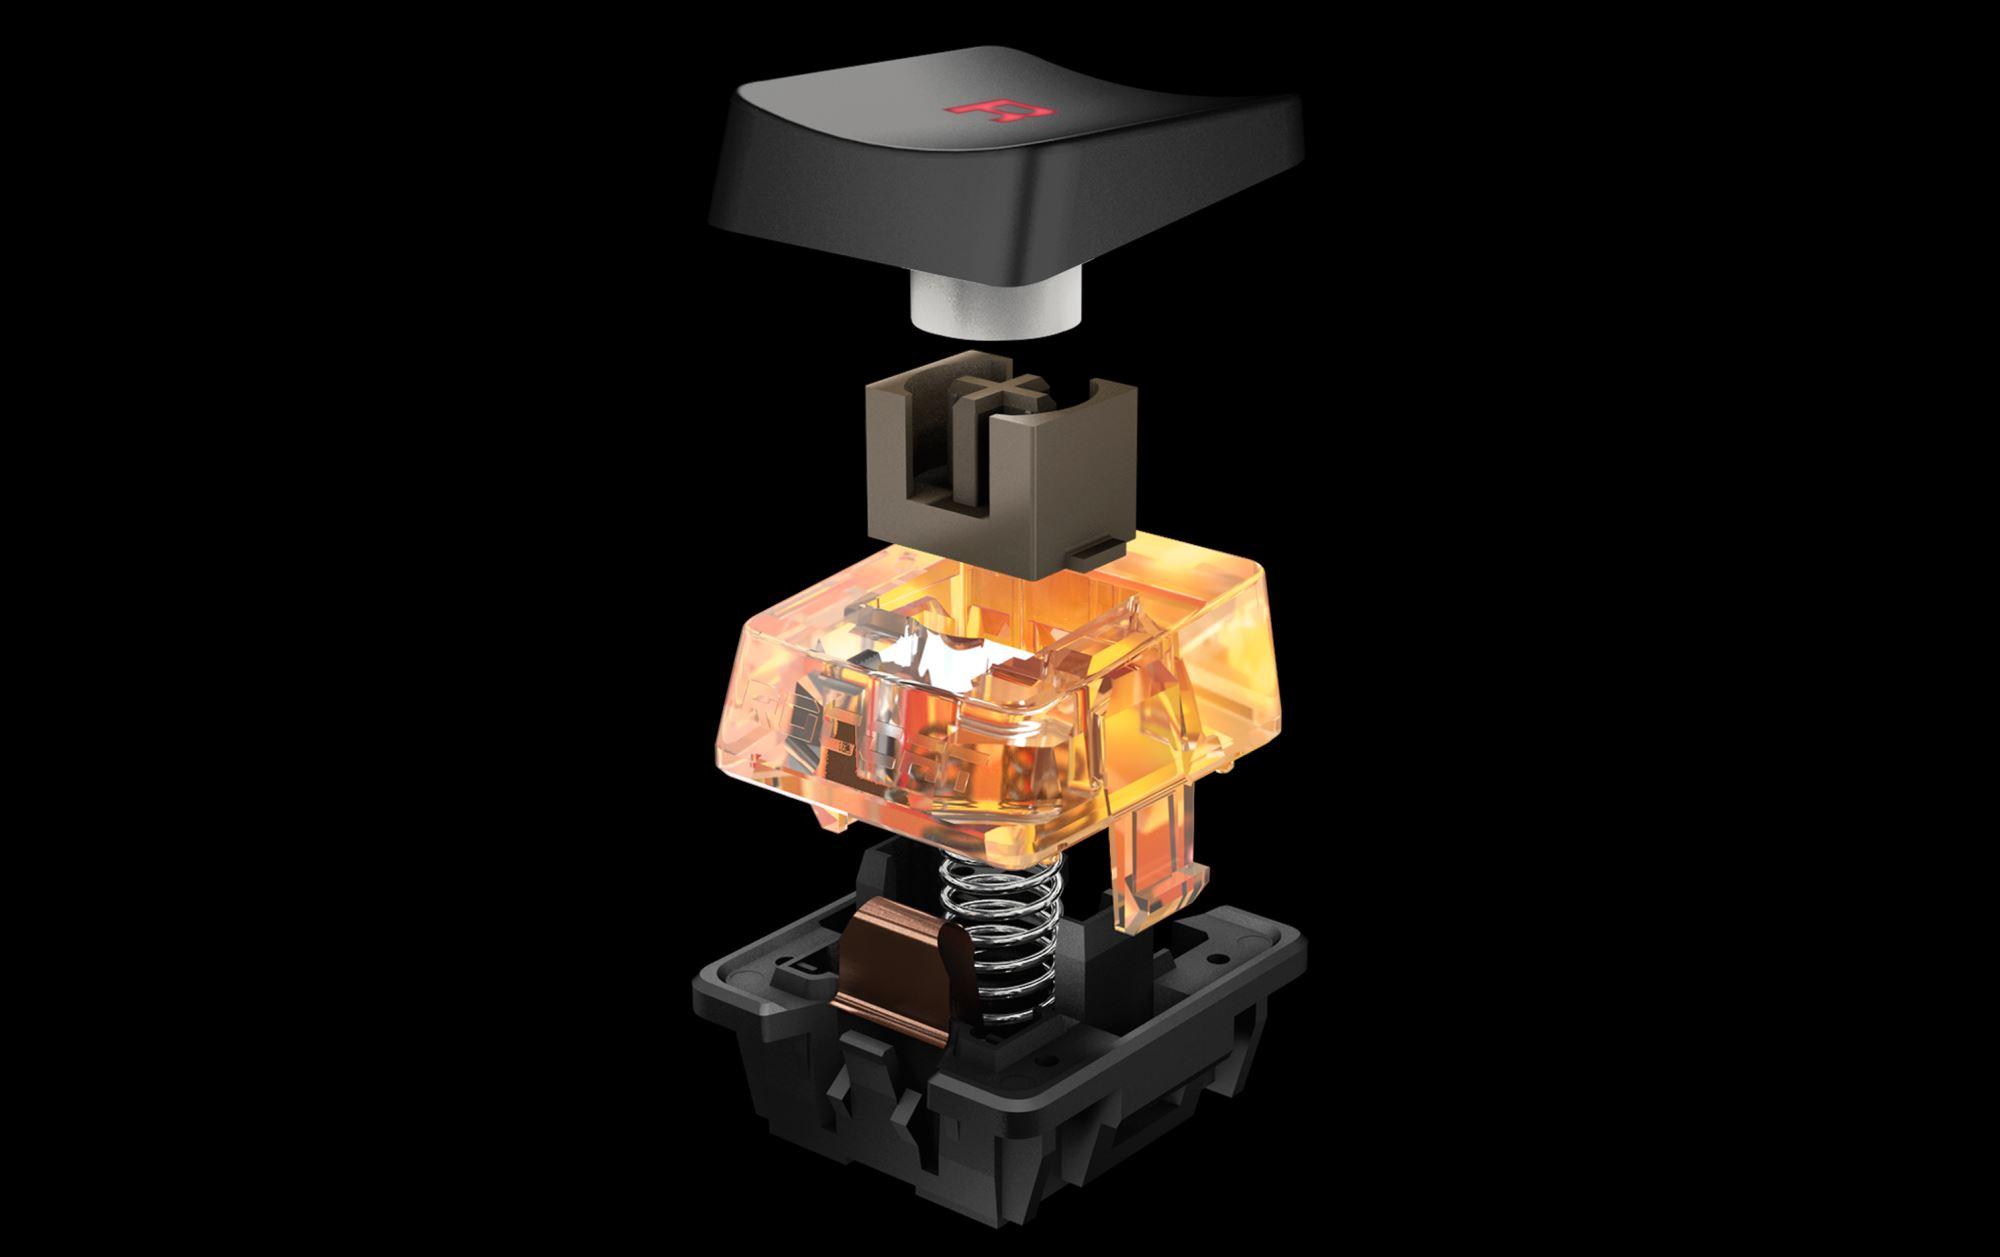 ROCCAT Titan Switch Tactile キースイッチ – 仕様・スペック・評価・レビュー